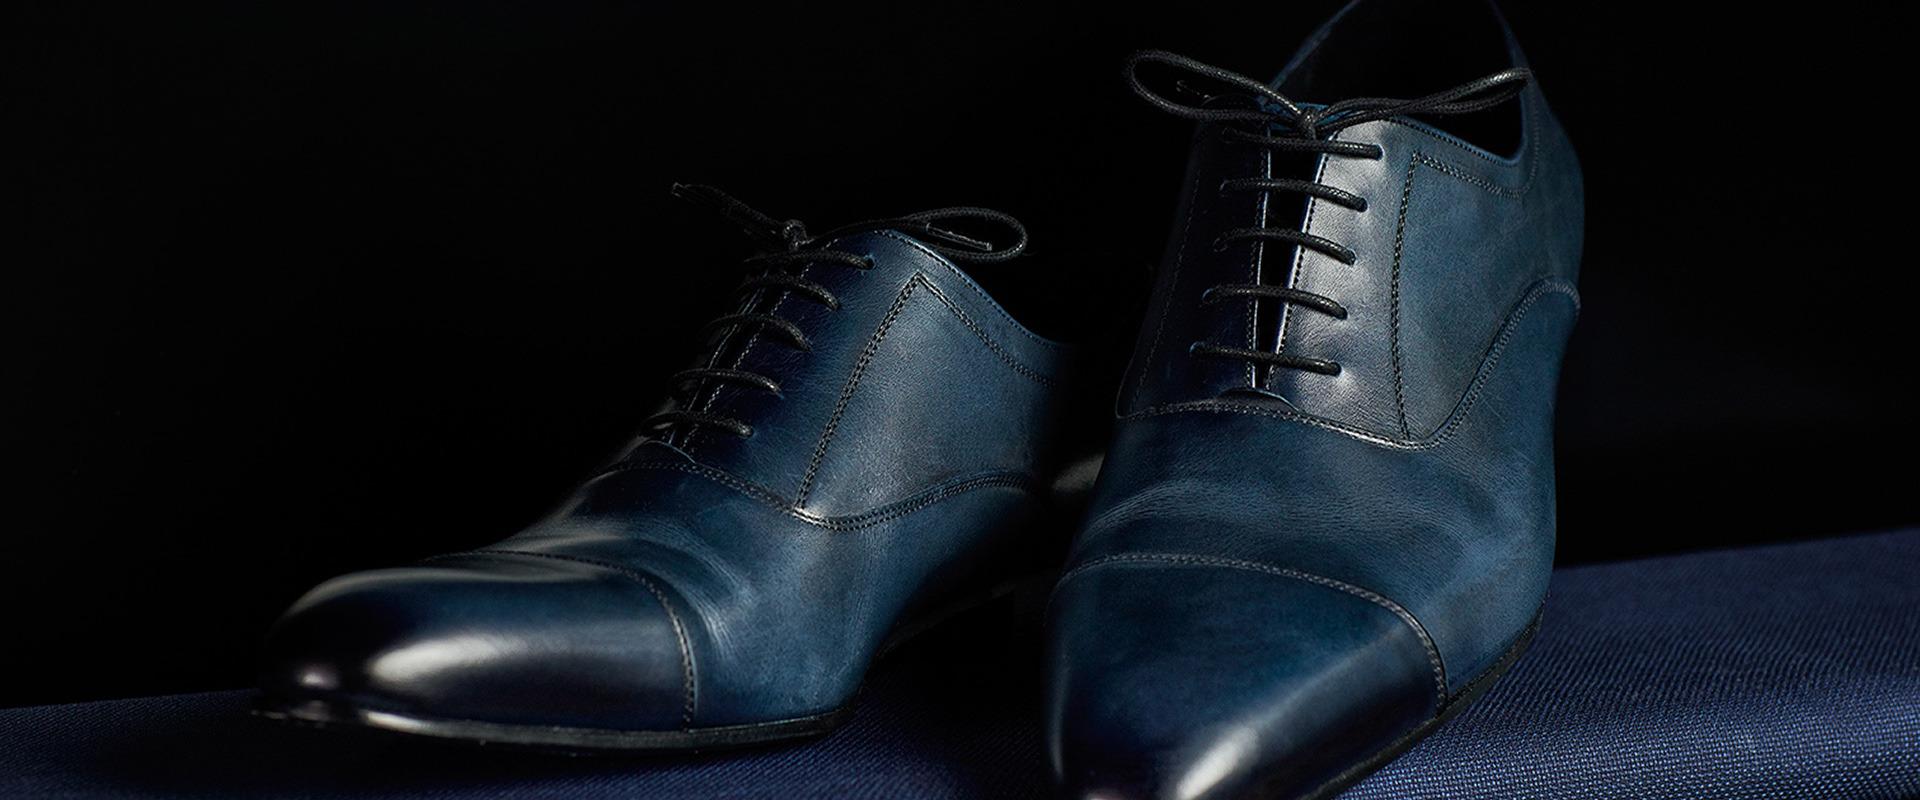 Entretien Chaussures